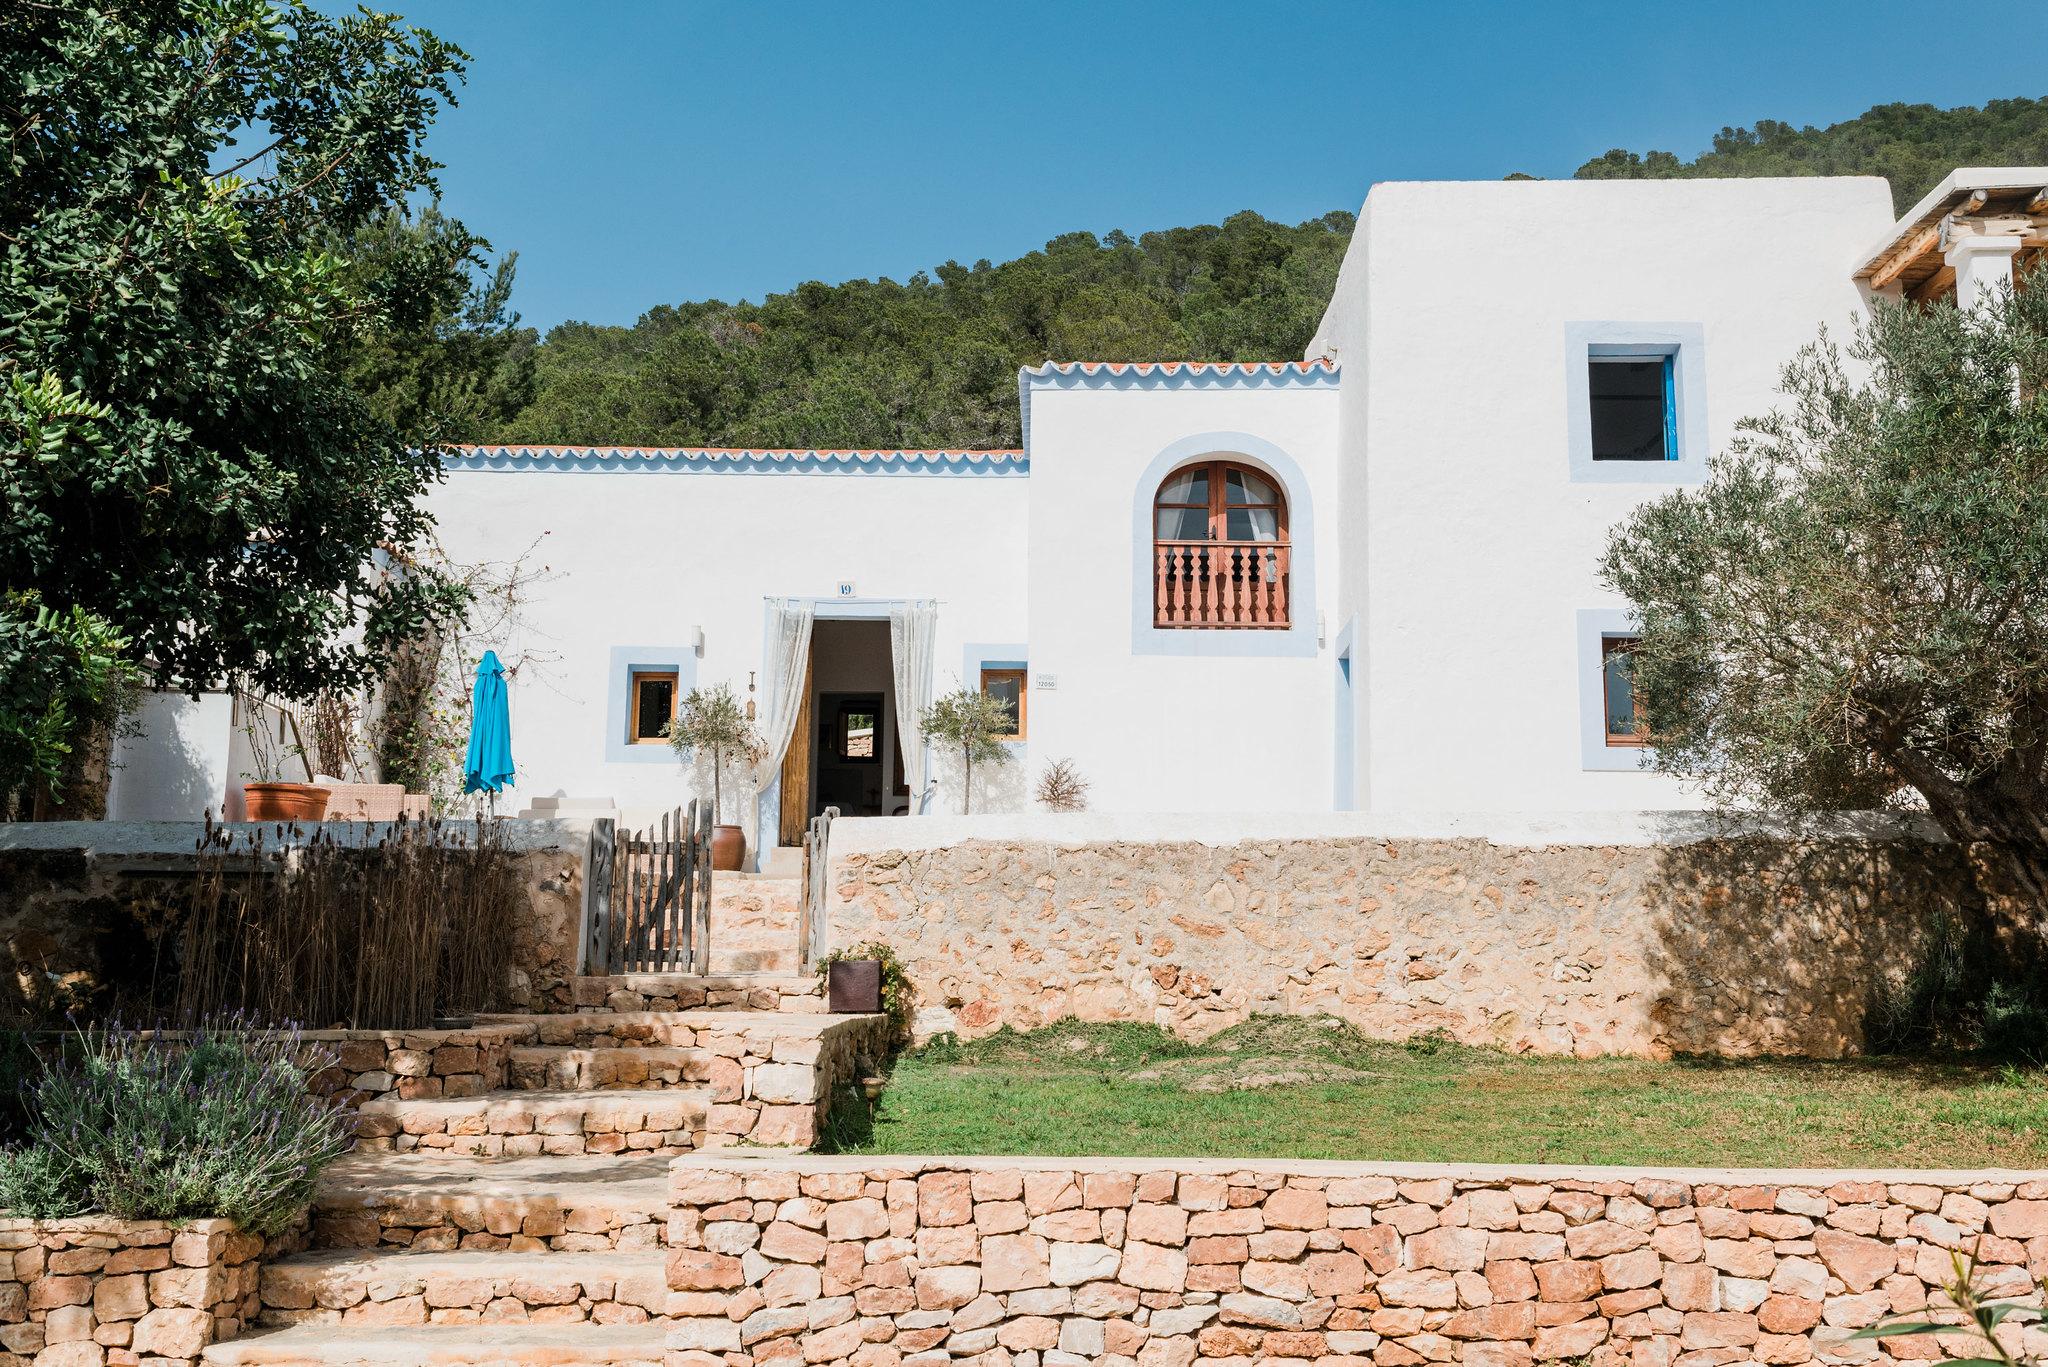 https://www.white-ibiza.com/wp-content/uploads/2020/06/white-ibiza-villas-los-corrales-exterior-house.jpg